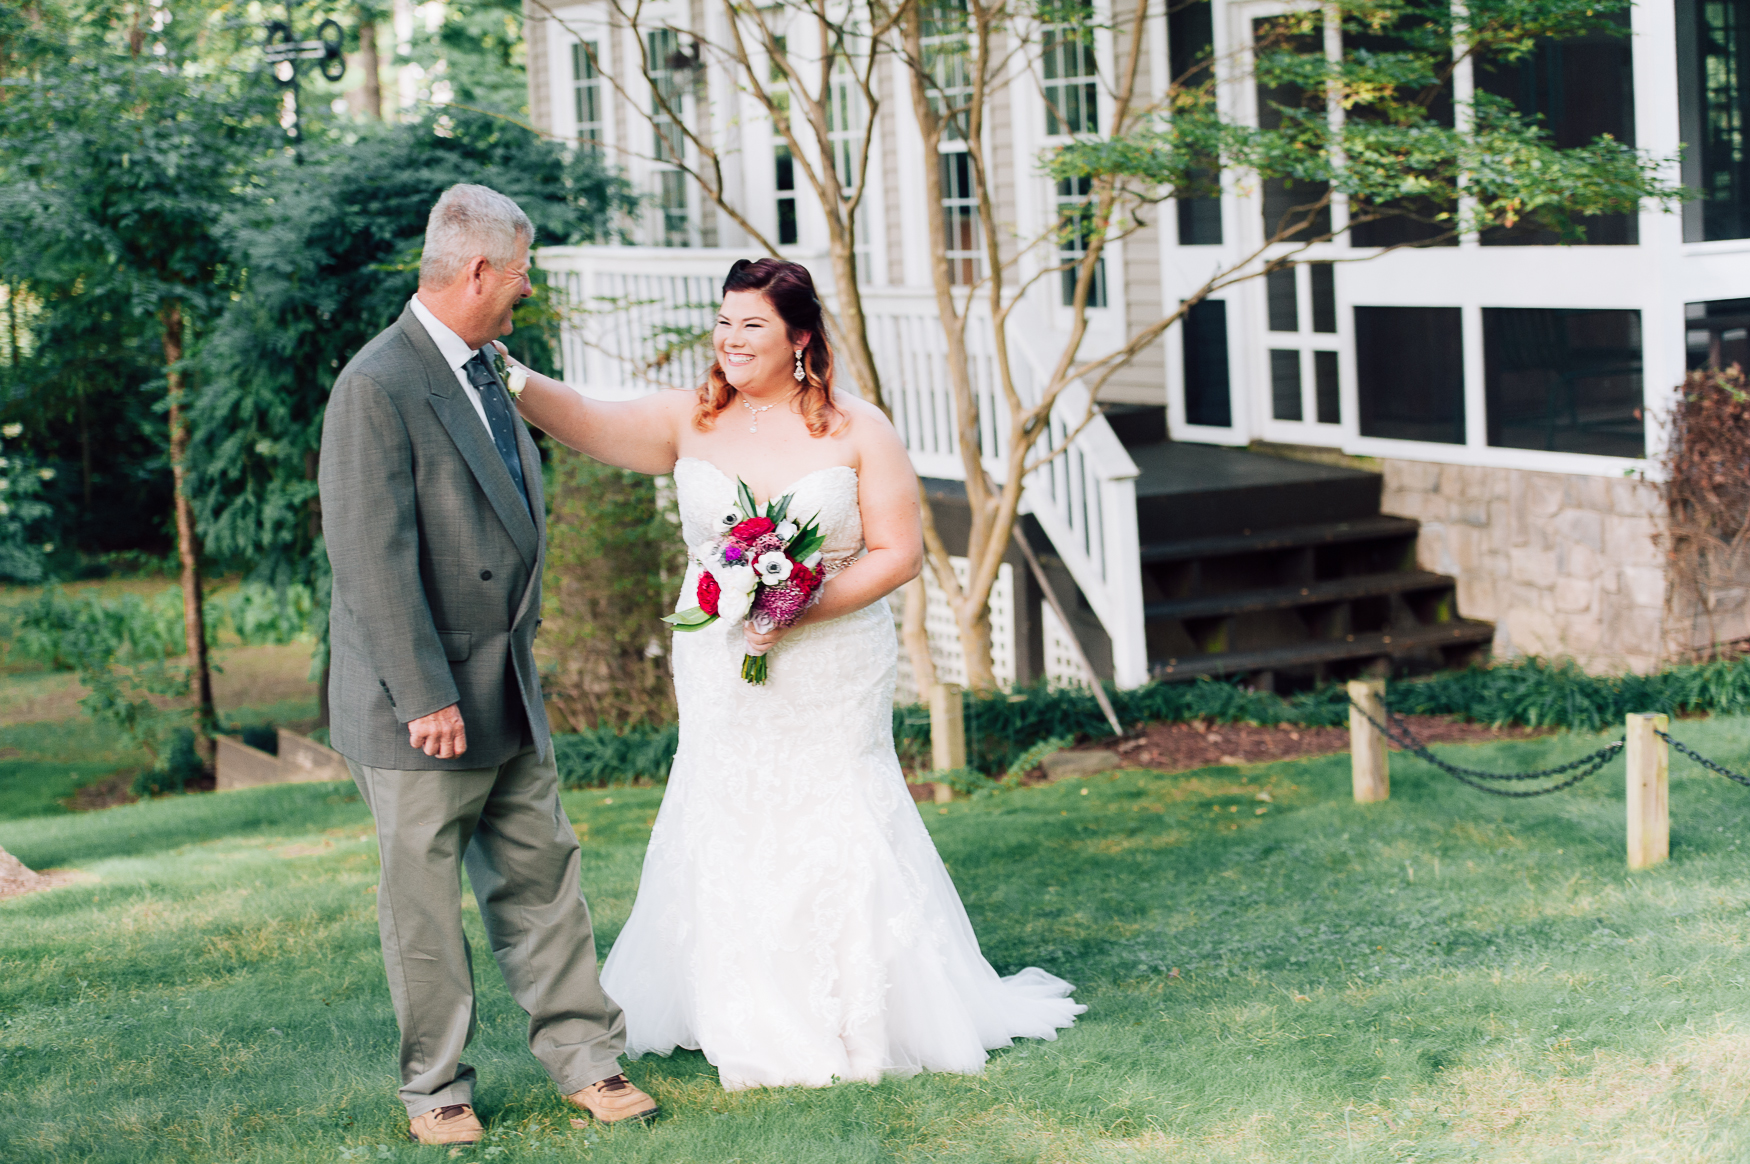 virginiawedding_GlenGarden_rusticwedding_fredericksburg_youseephotography_KellySteven (19).jpg